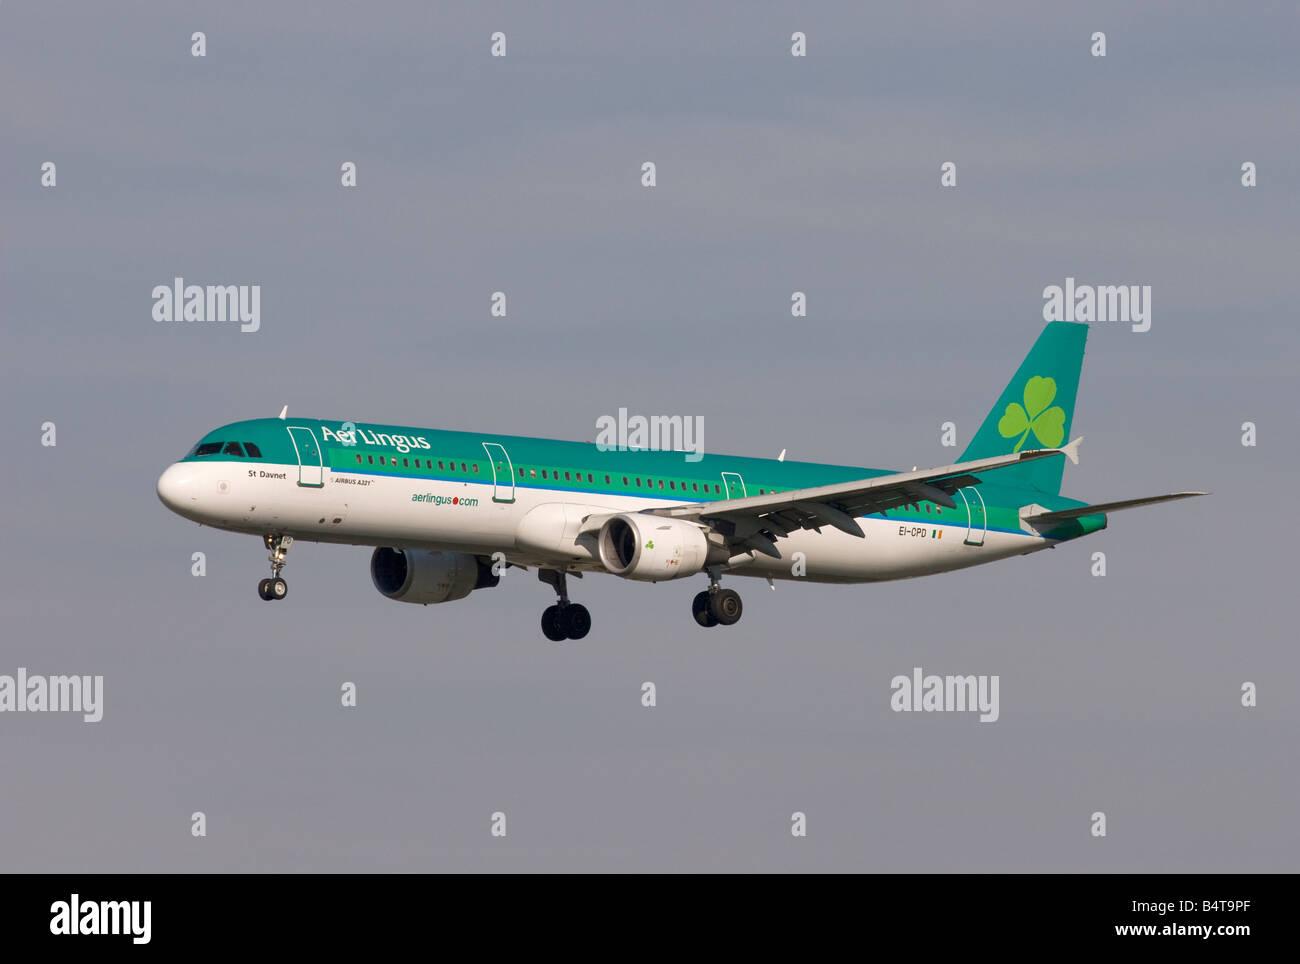 Aer Lingus Airbus A321-211 landing at London Heathrow - Stock Image